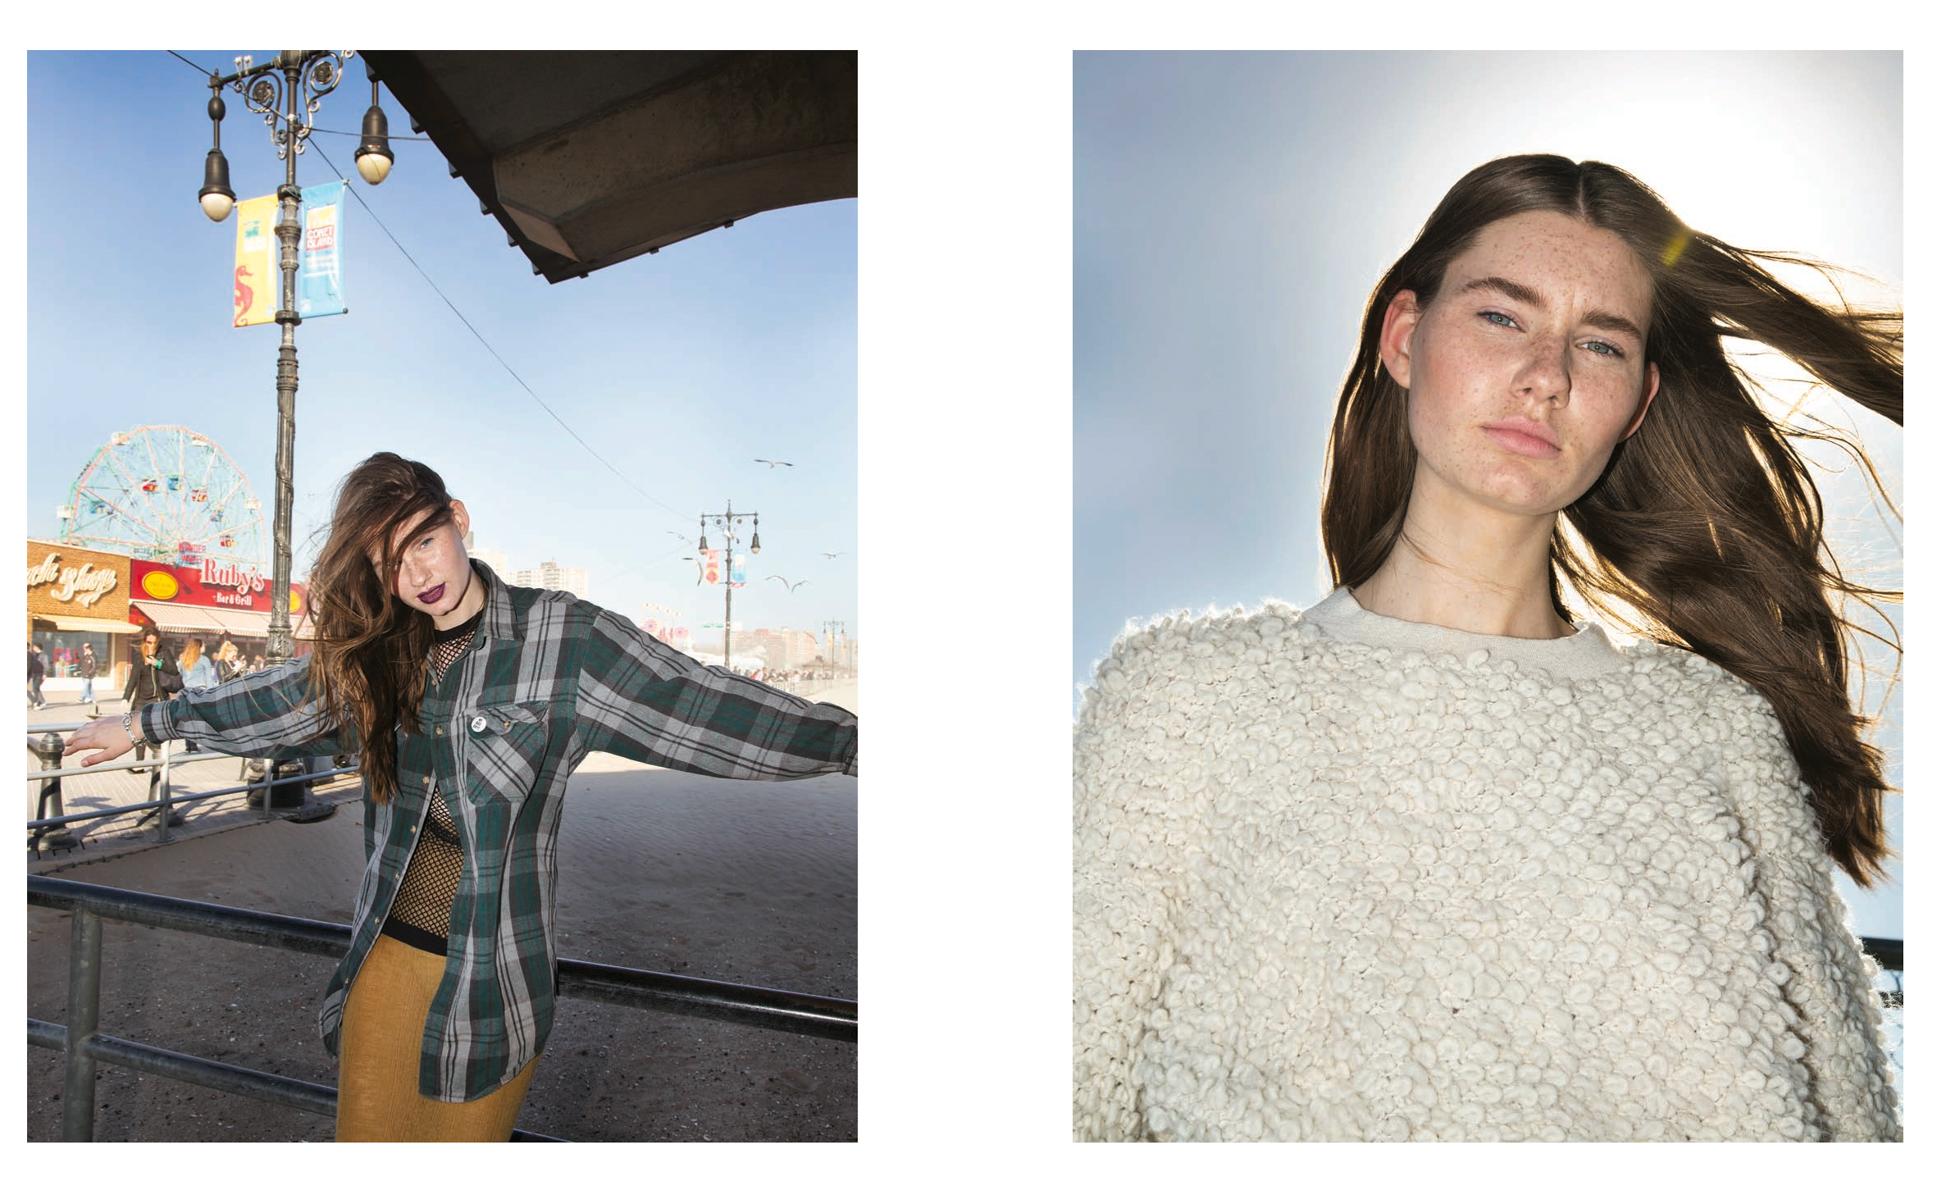 contrast4.jpg